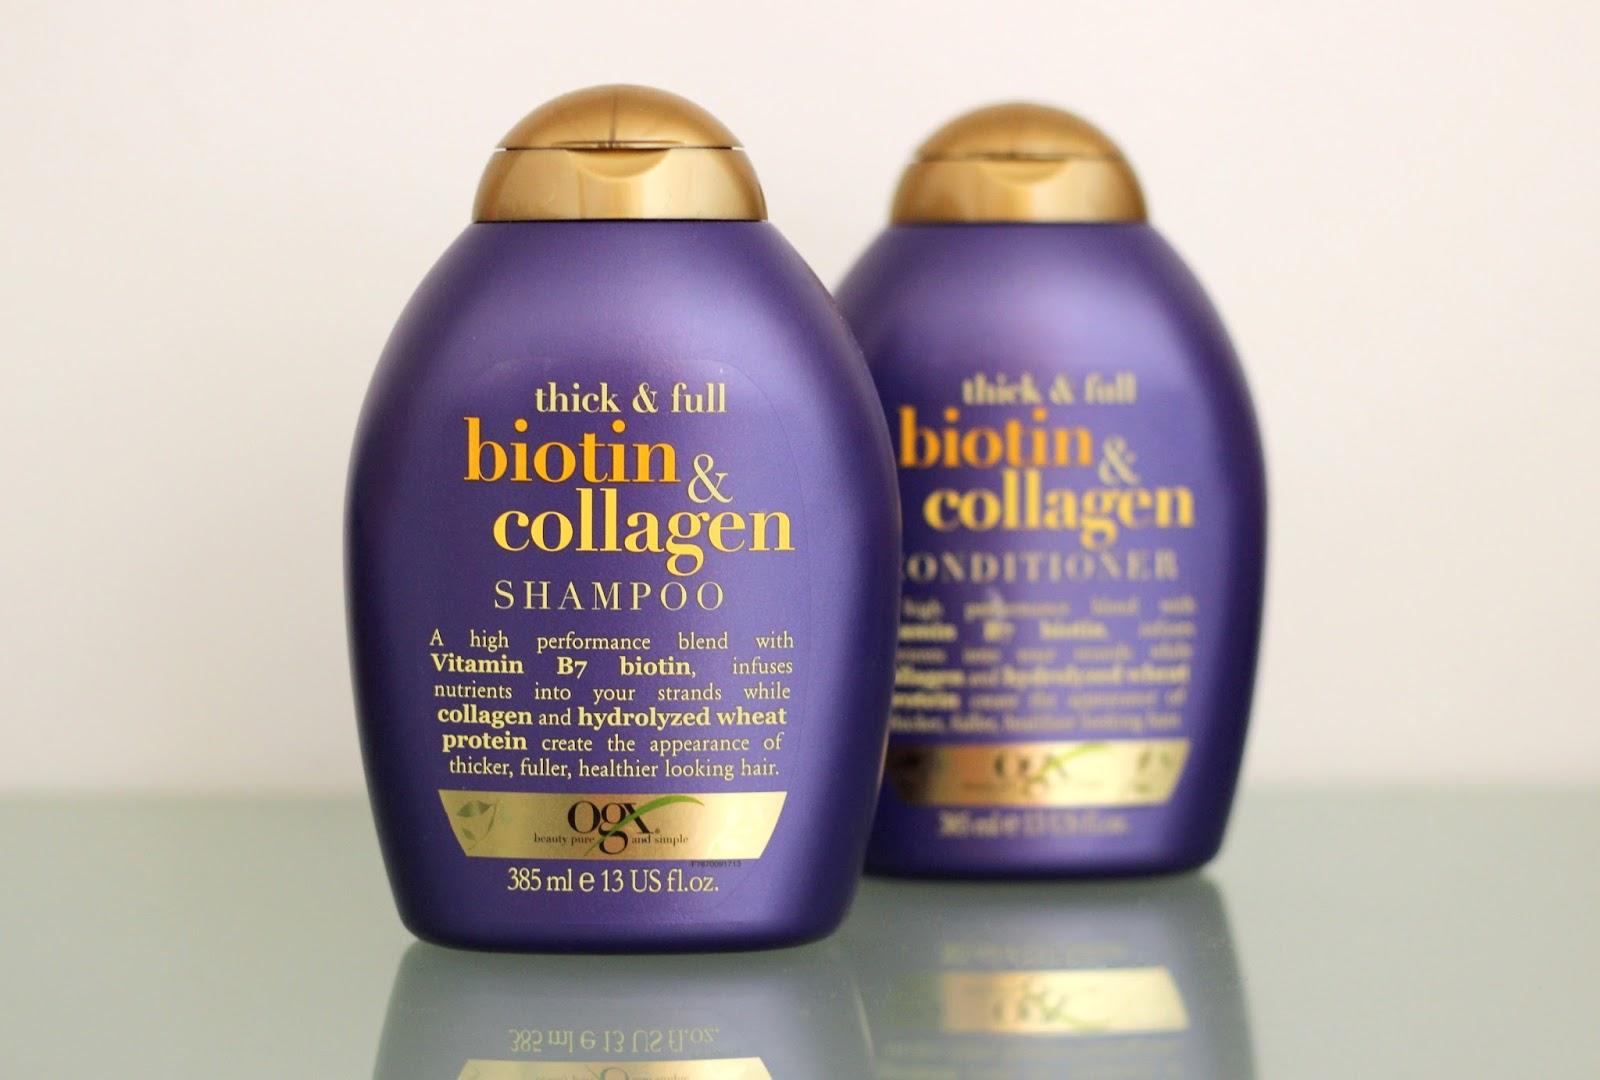 Organix Biotin and Collagen Shampoo and Conditioner